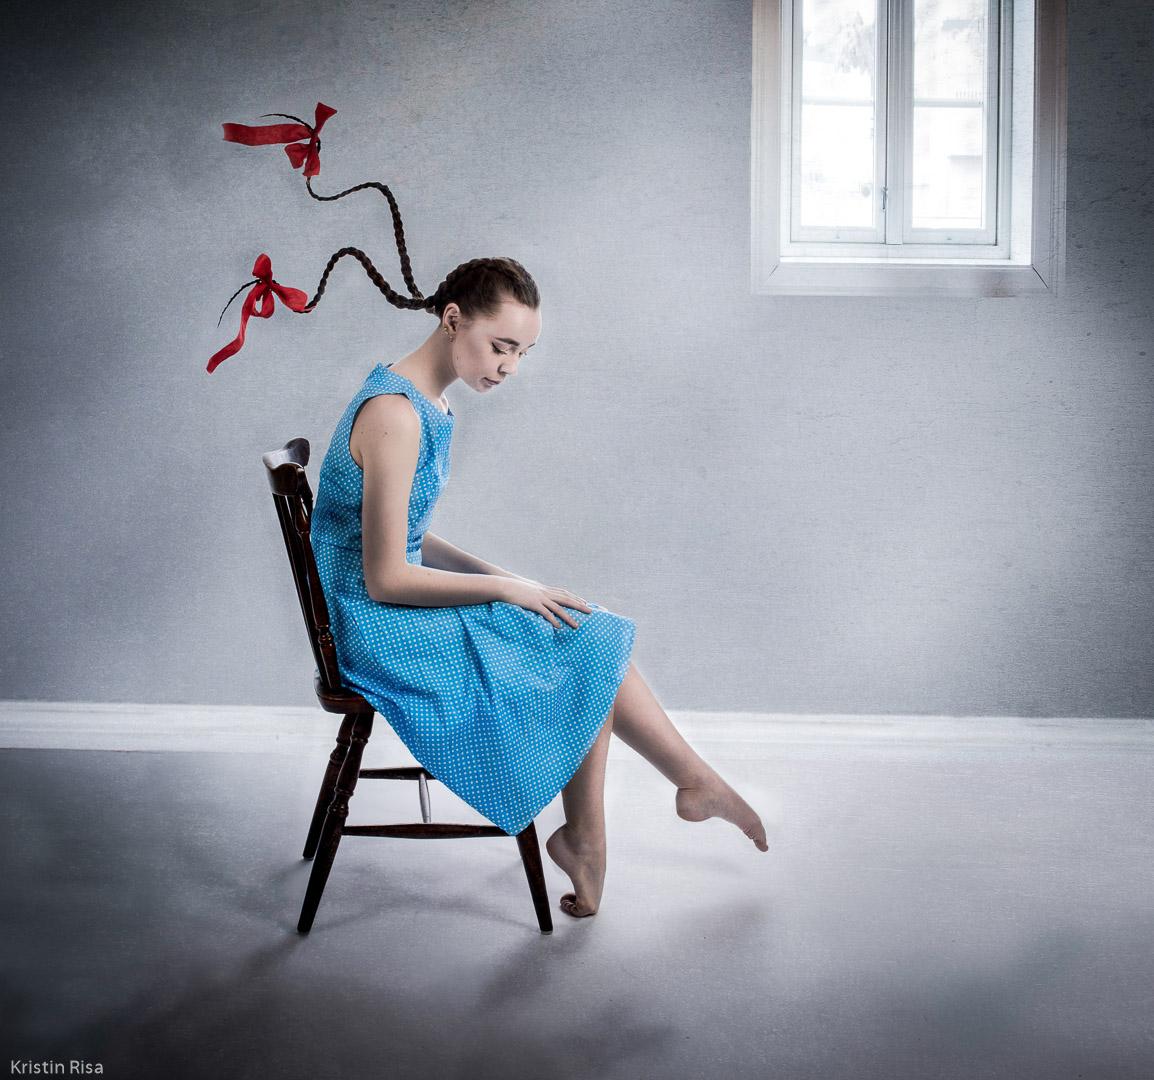 Portrett-Hederlig omtale-Kristin Risa-Sad with flying braids